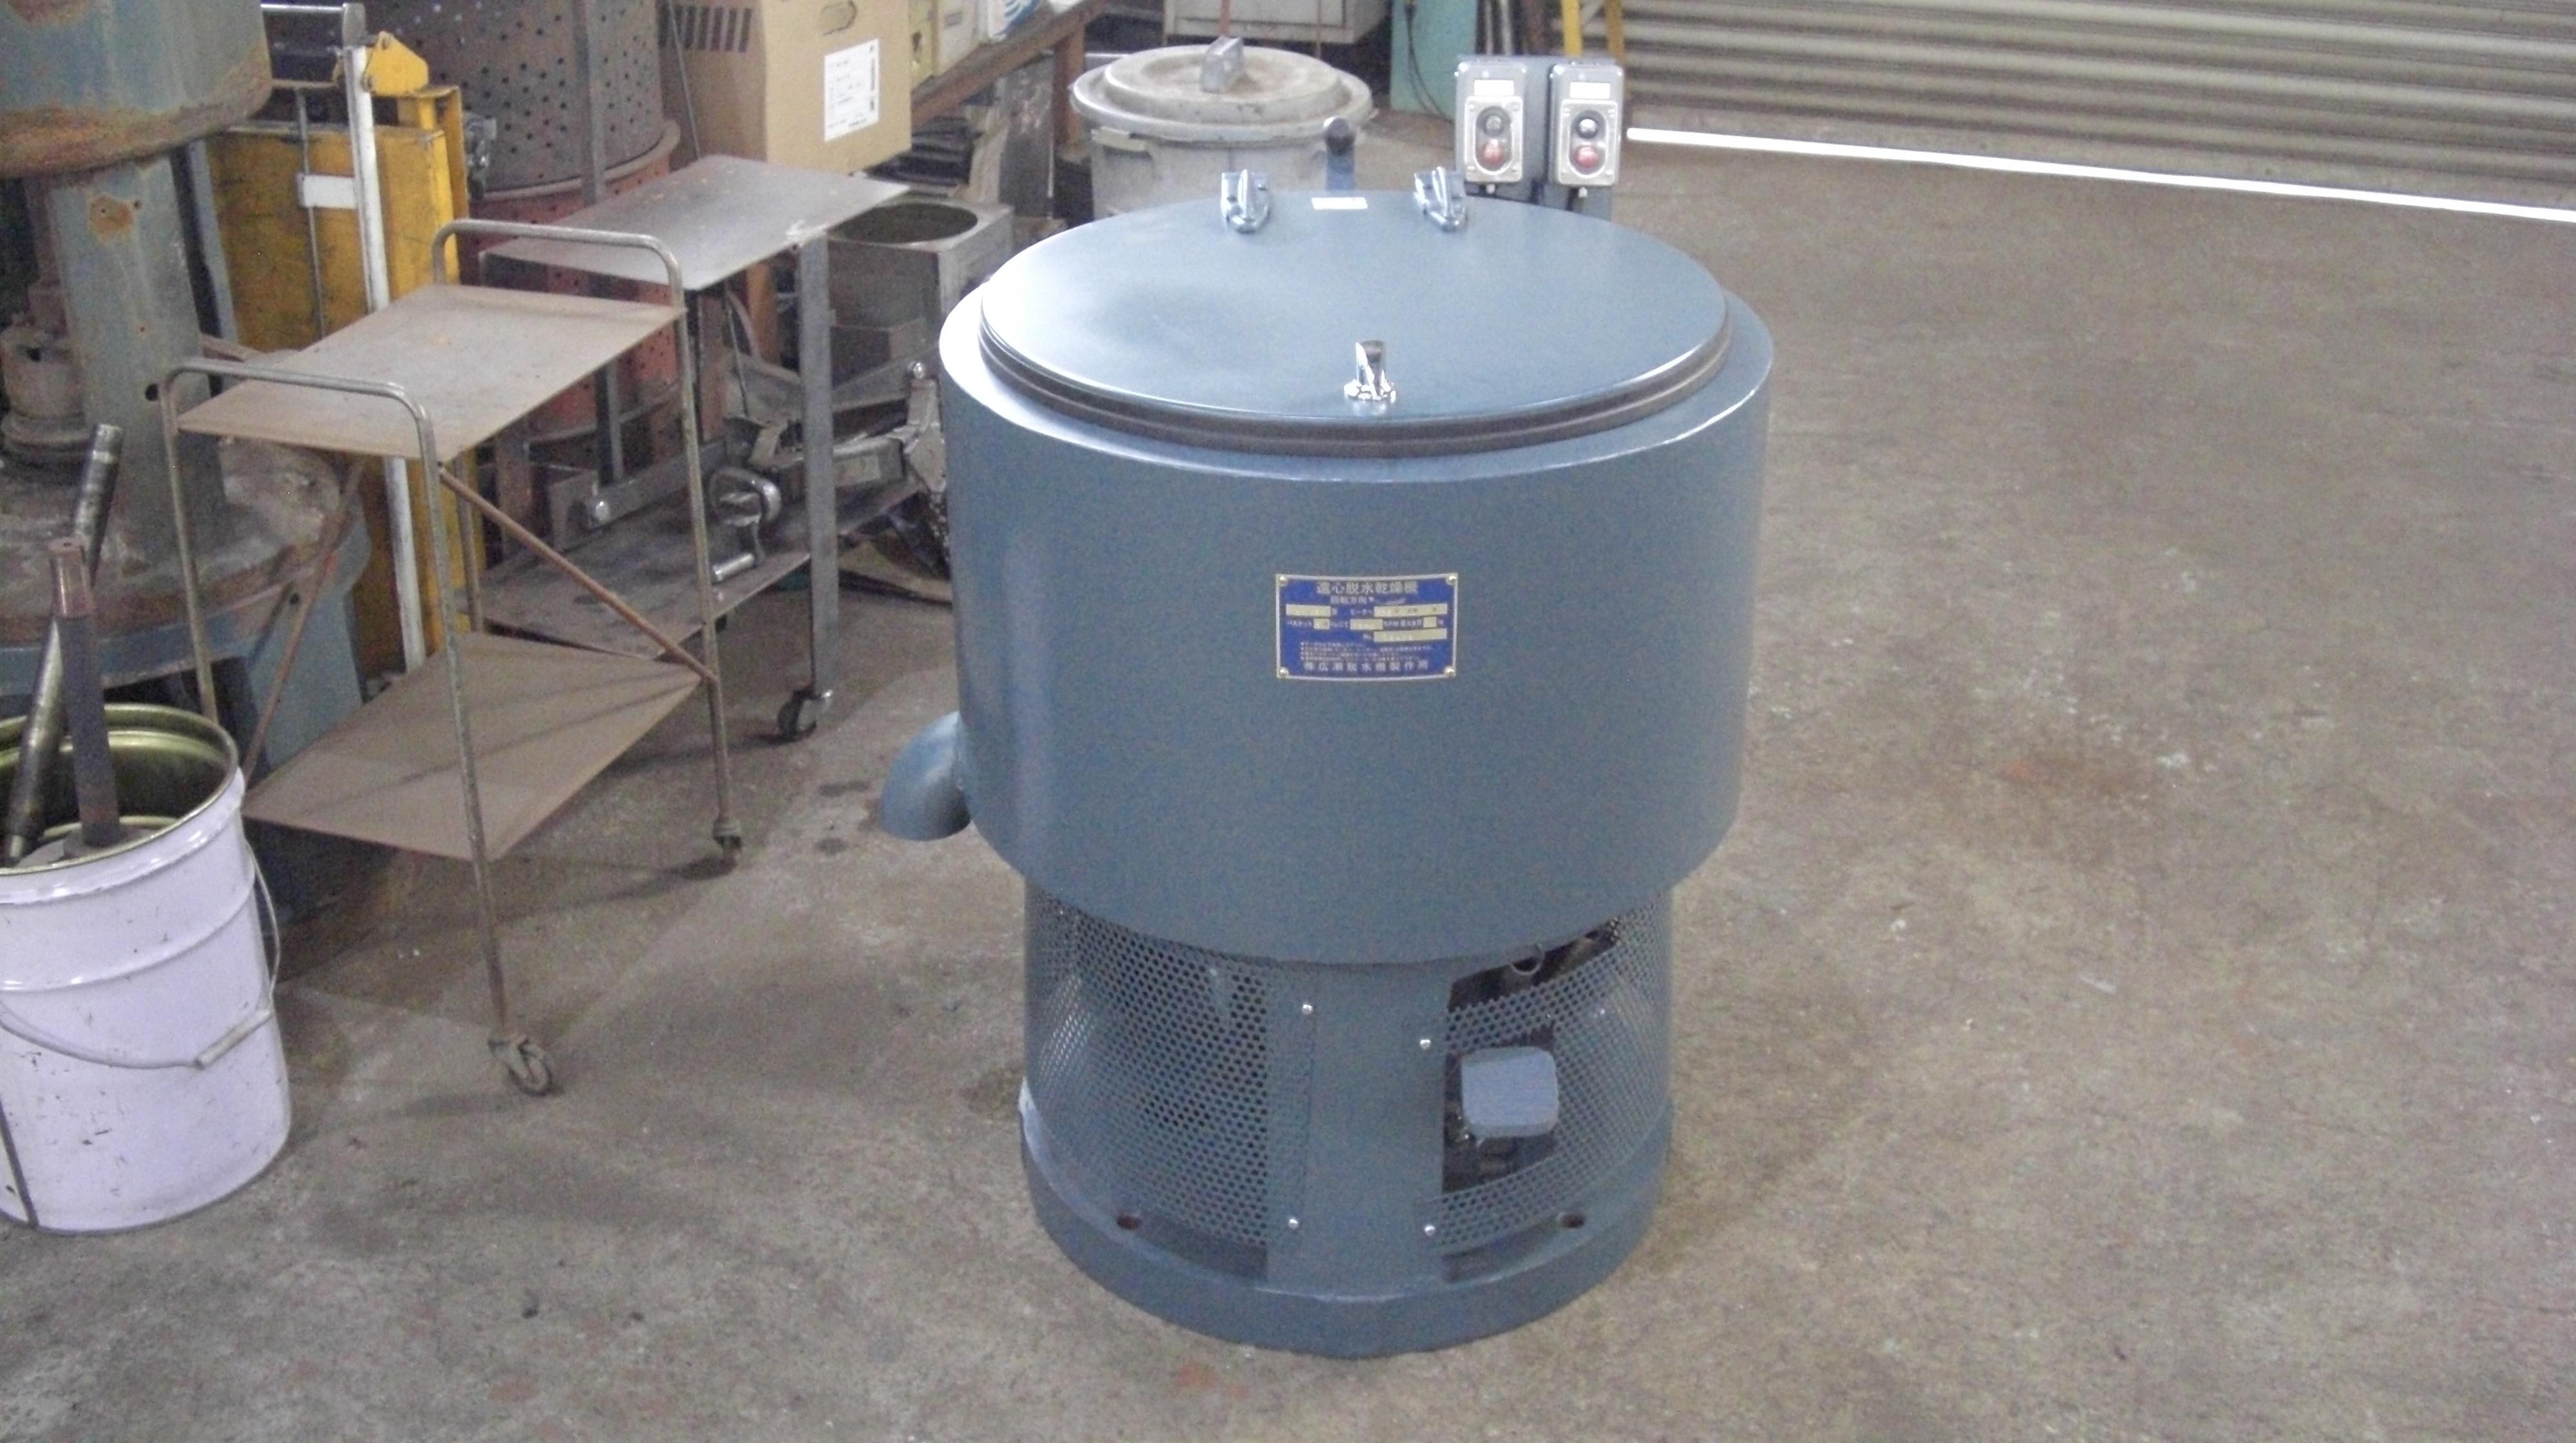 遠心分離乾燥機 ボス型 NB-45N型 容量38L